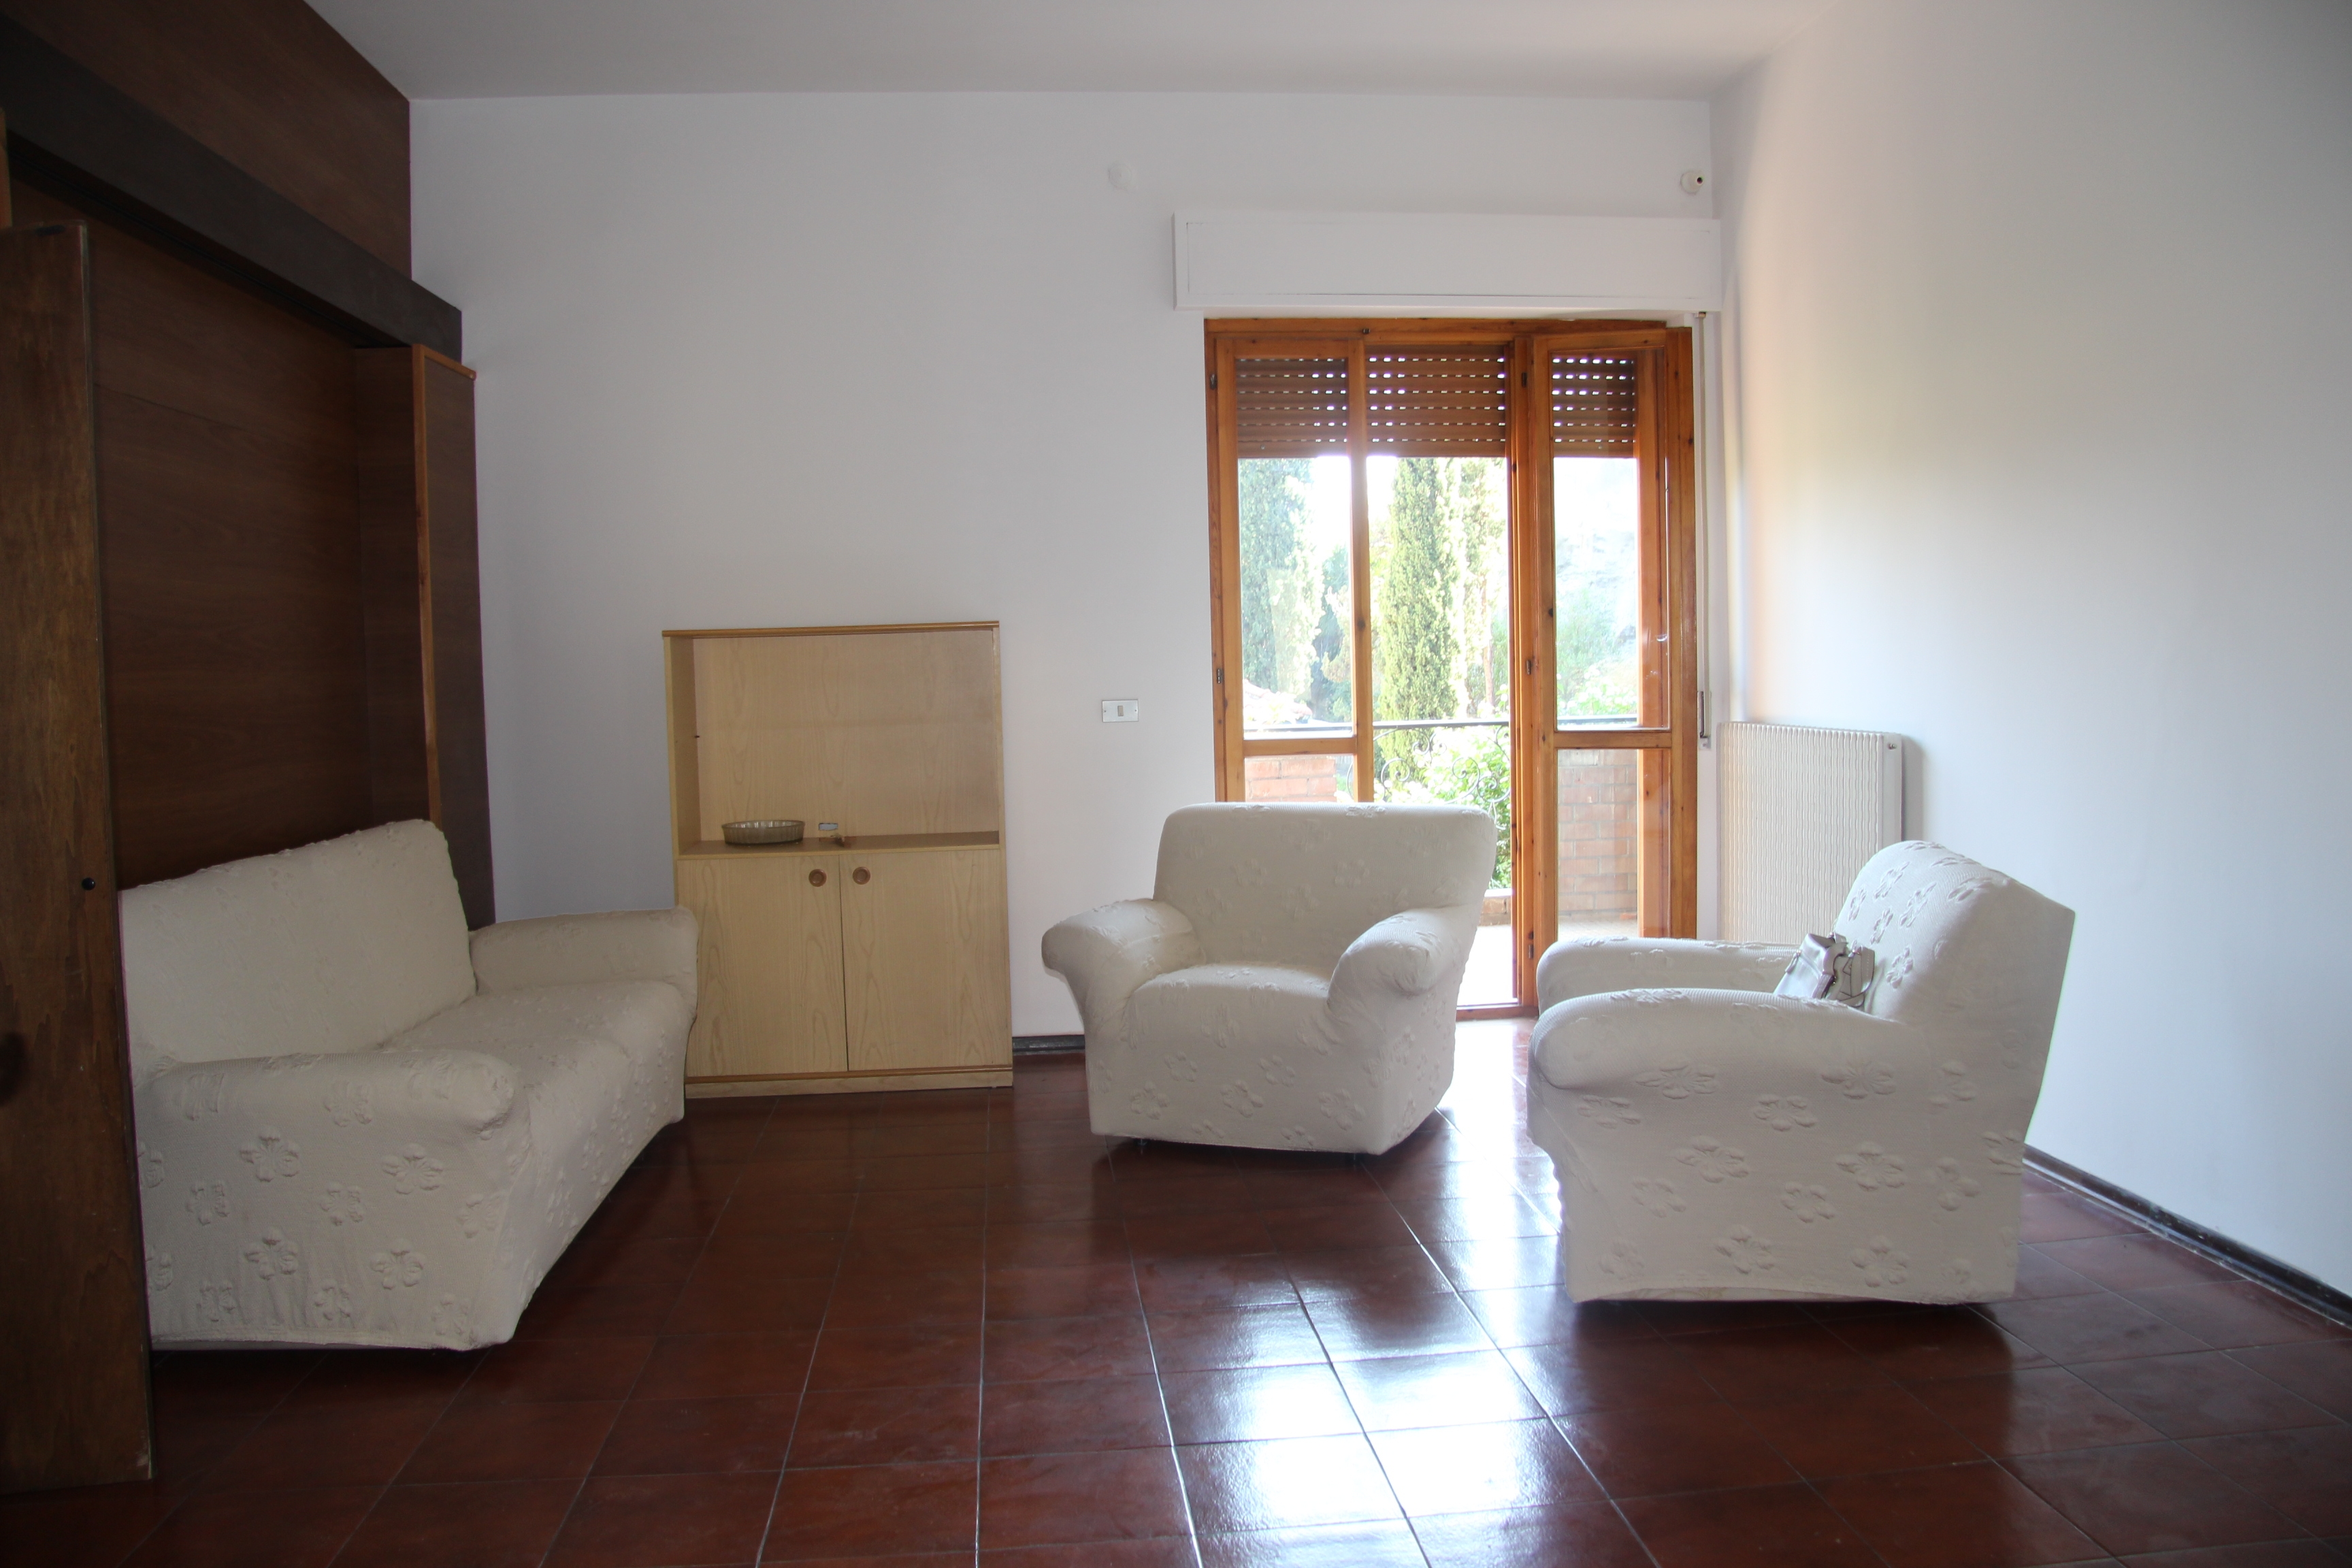 Wide two-room apartment Conca Verde Vallecrosia border to Bordighera ...